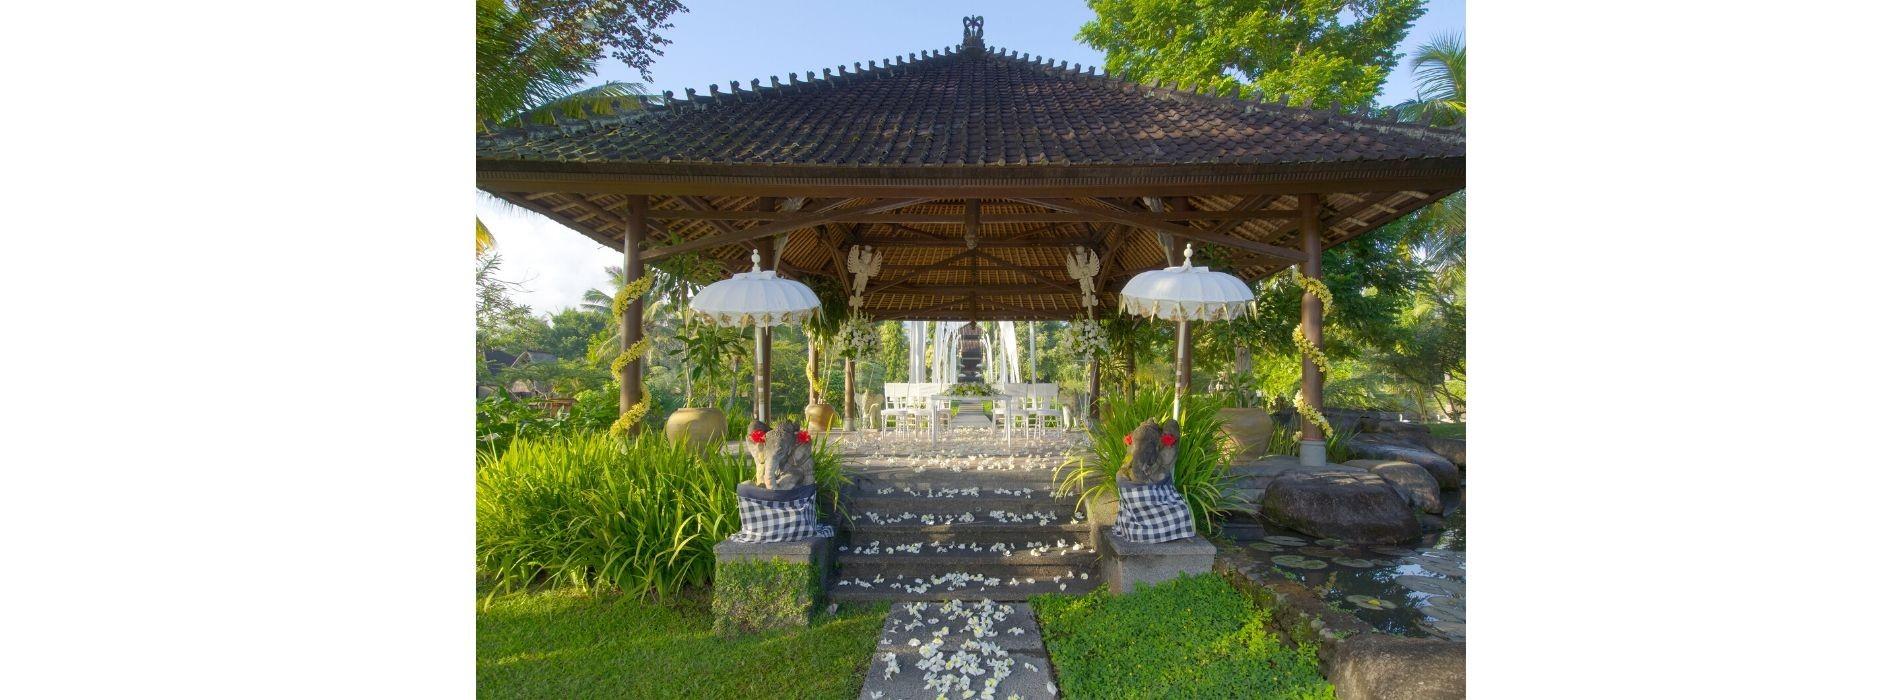 Resorts in Asia Enhence Hygiene